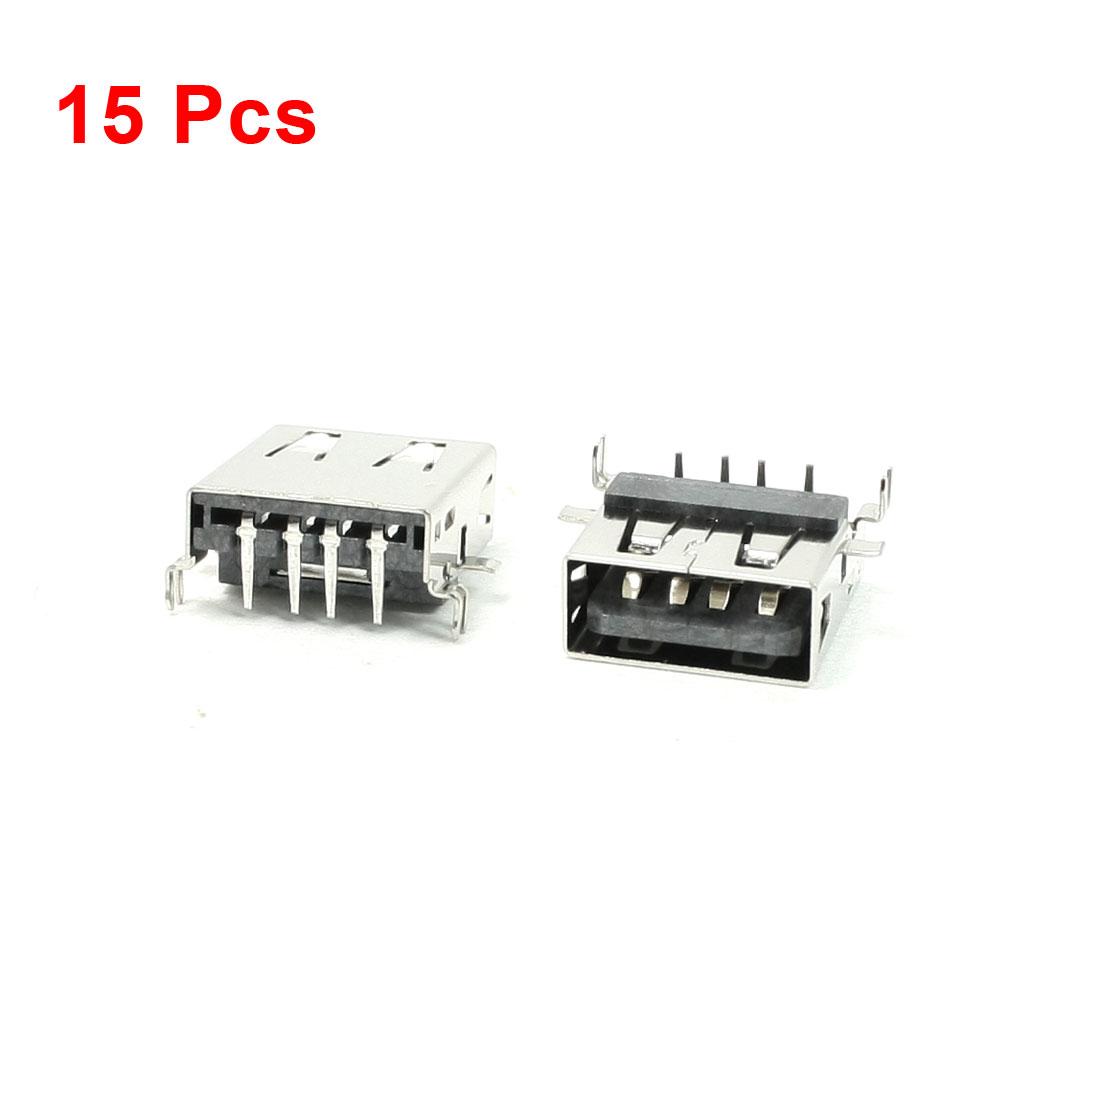 15Pcs Type A USB2.0 Female PCB Mount Port Jacks for PC Computer